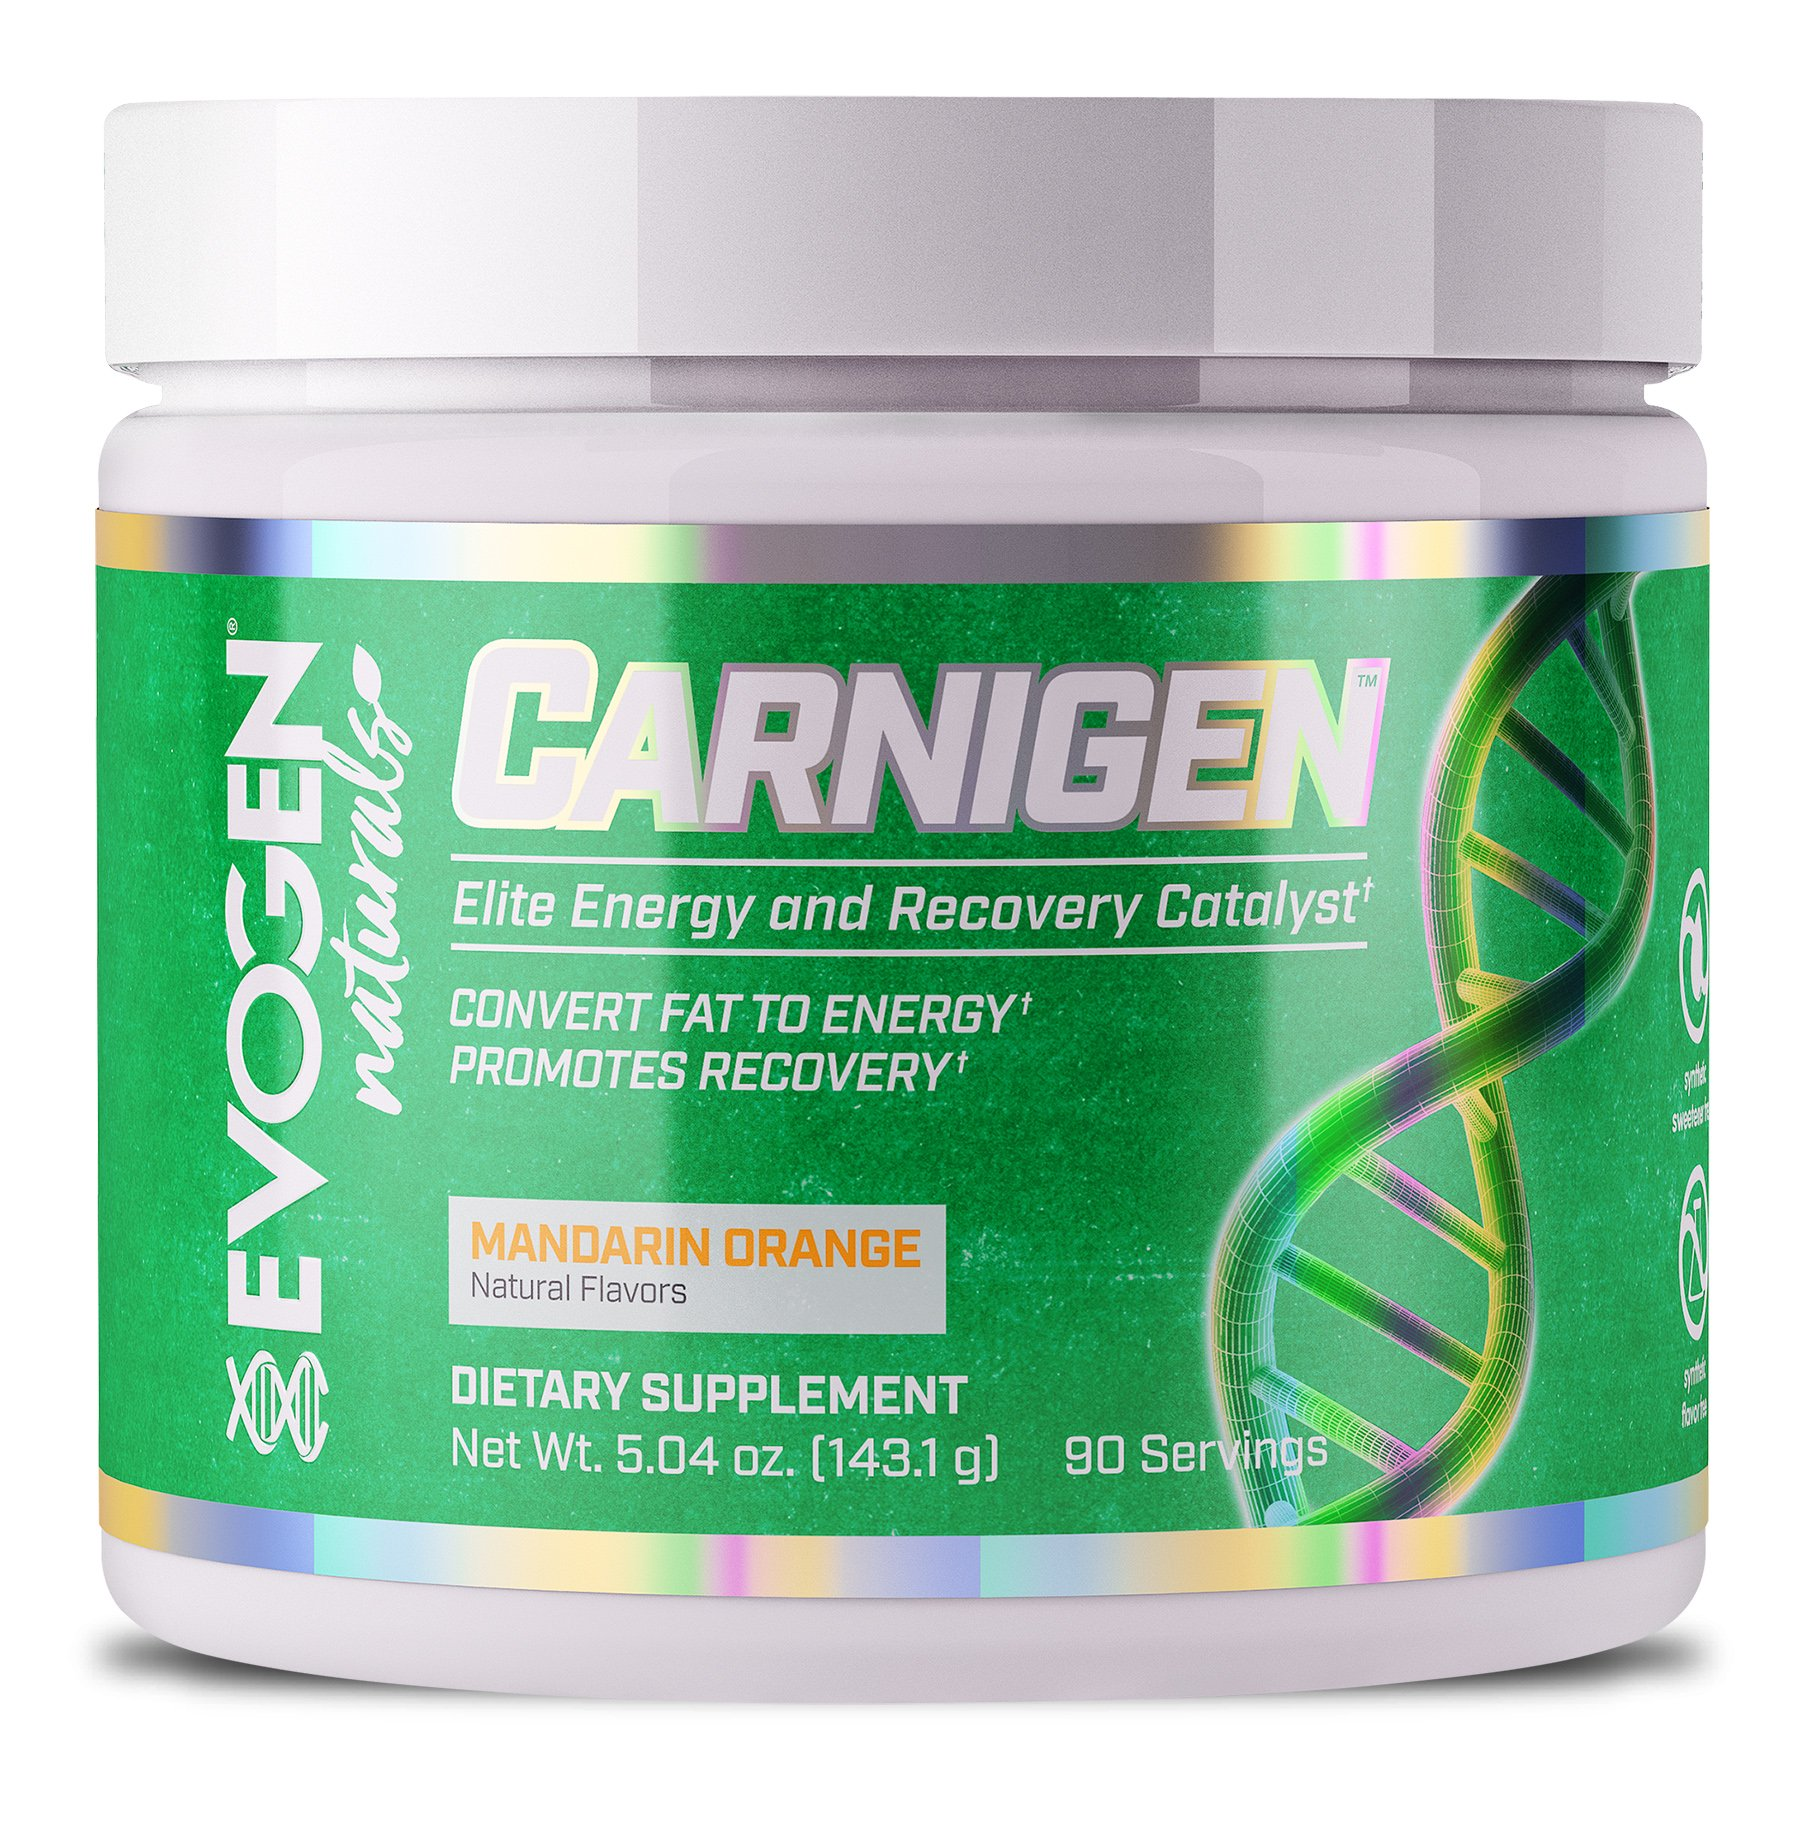 EVOGEN CARNIGEN Naturals, Carnitine Fat Burning Powder, Carnitine Tartrate, Acetyl-l-carnitine, Carnitine Orotate, Carnitine Fumarate, Bioperine (Mandarin Orange)